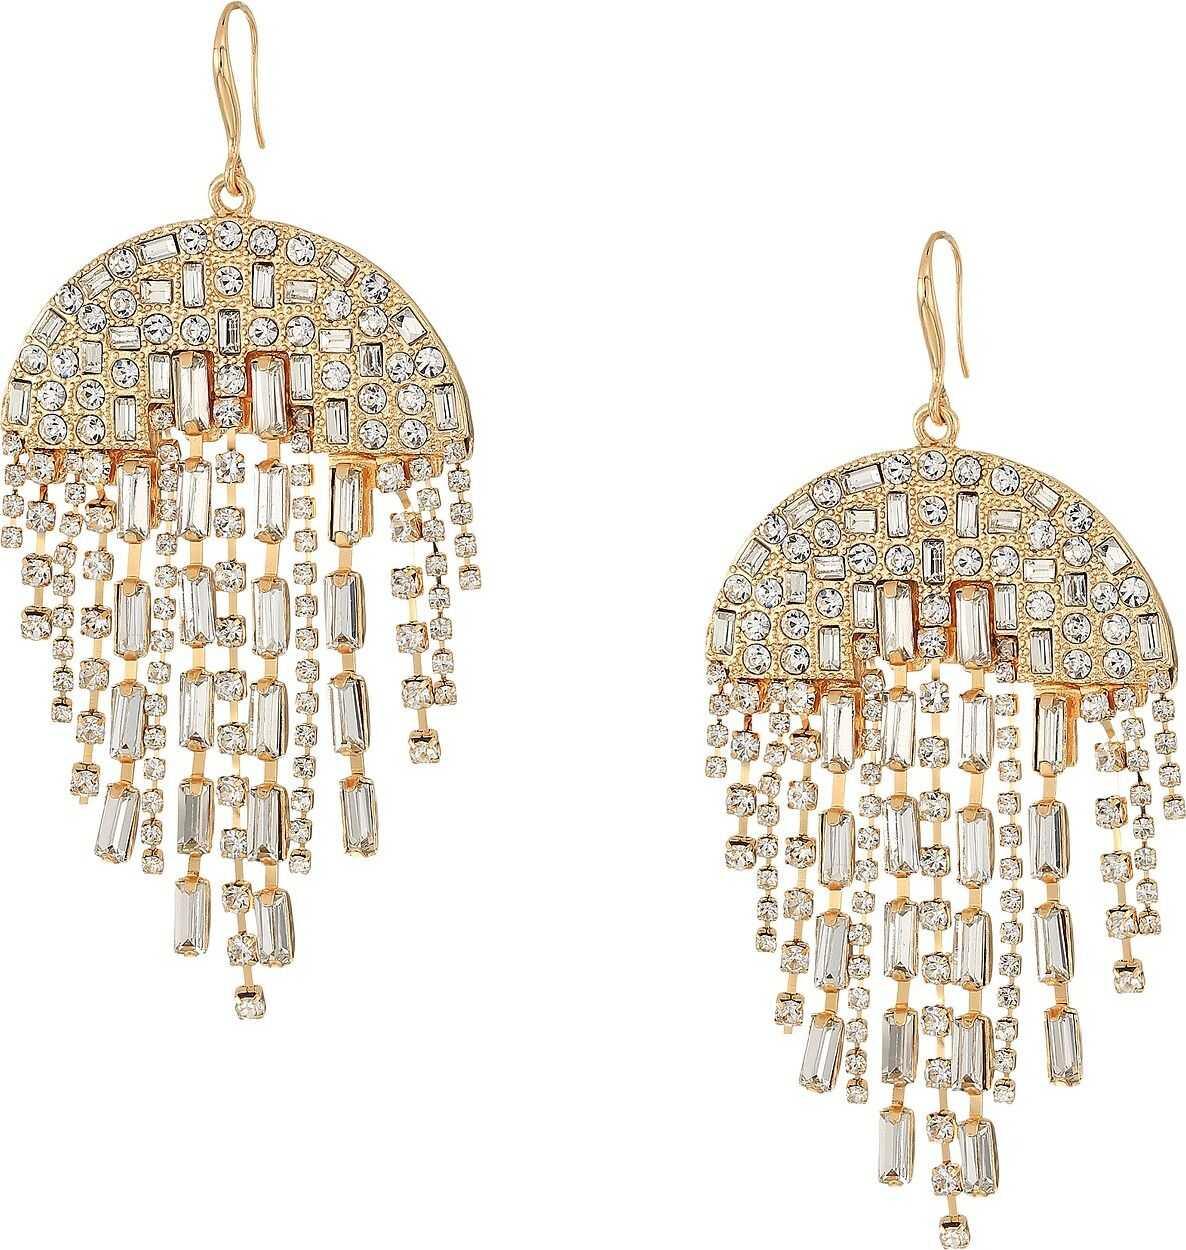 Steve Madden Semi-Circle Rhinestone Chandelier Earrings Gold